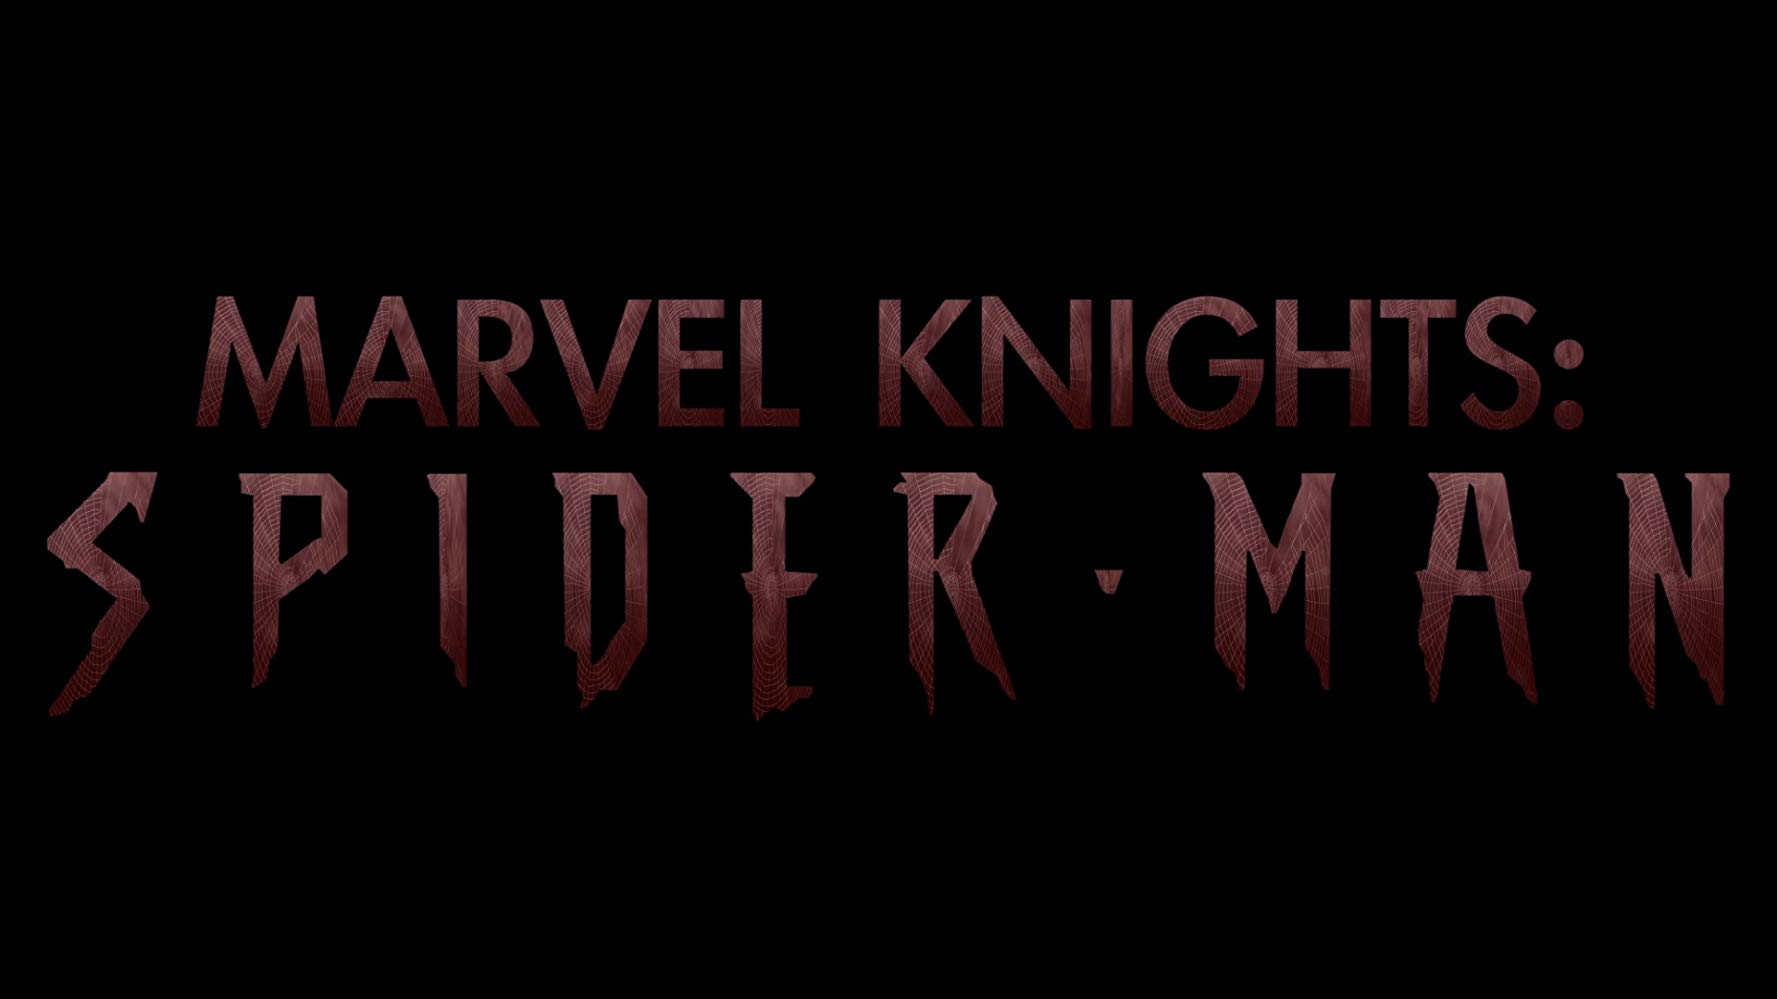 Marvels Spider-Man S02E08 WEB x264-TBS